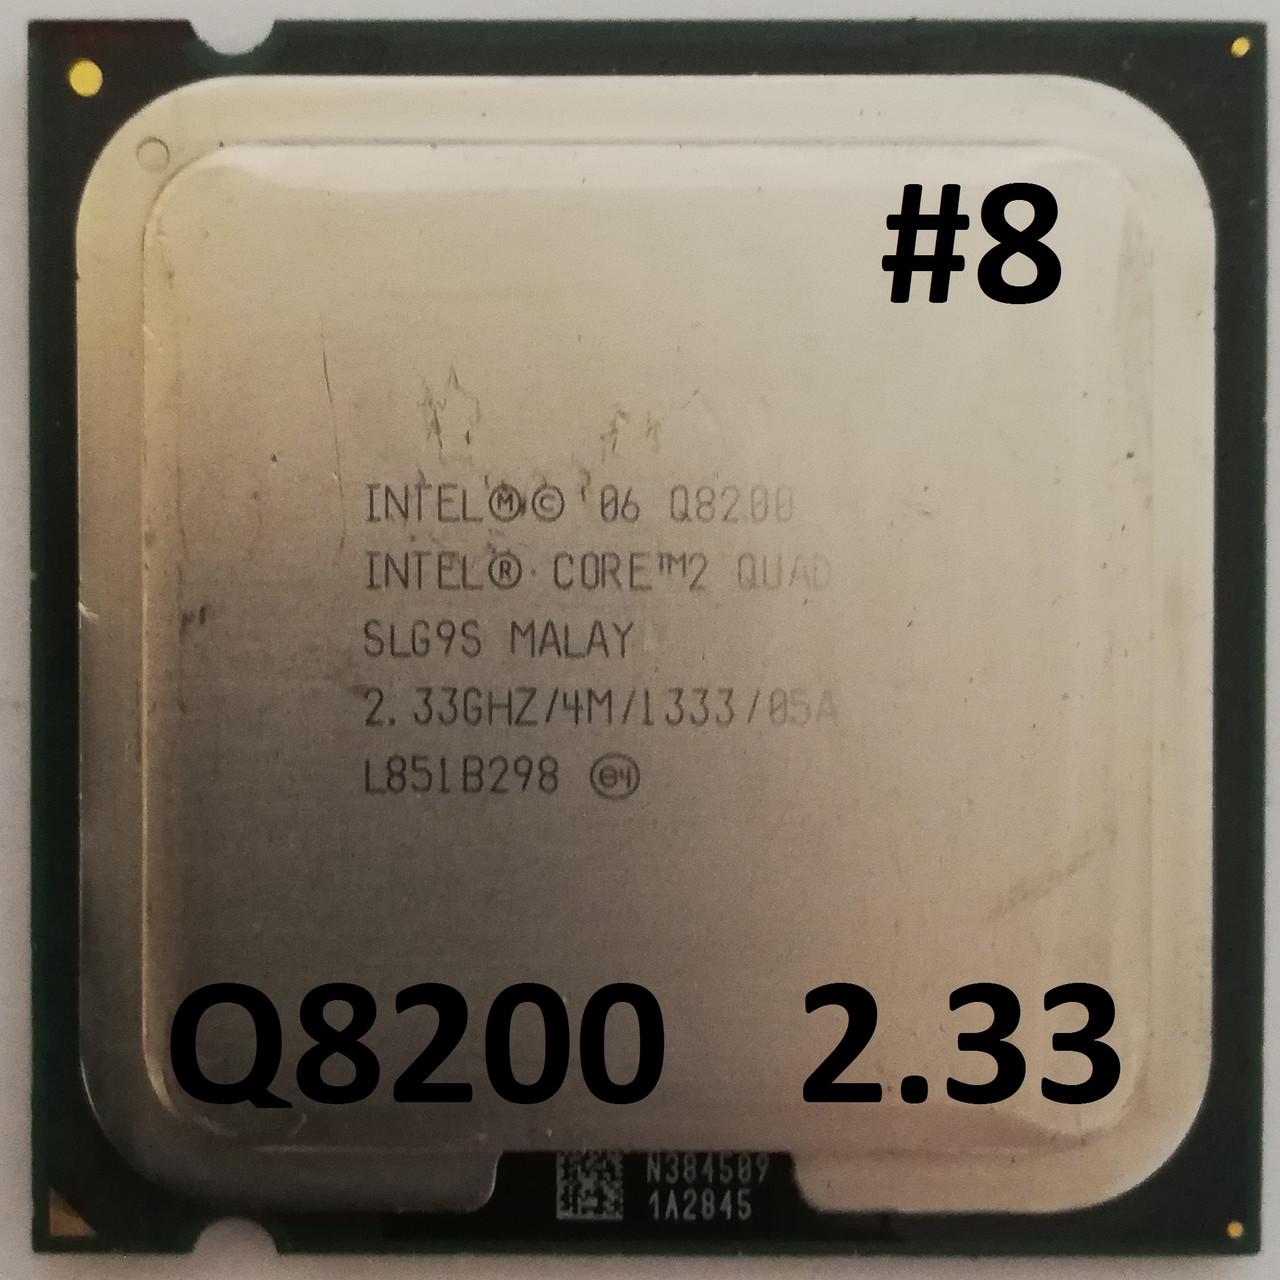 Процессор ЛОТ#8 Intel® Core™2 Quad Q8200 R0 SLG9S 2.33GHz 4M Cache 1333 MHz FSB Socket 775 Б/У